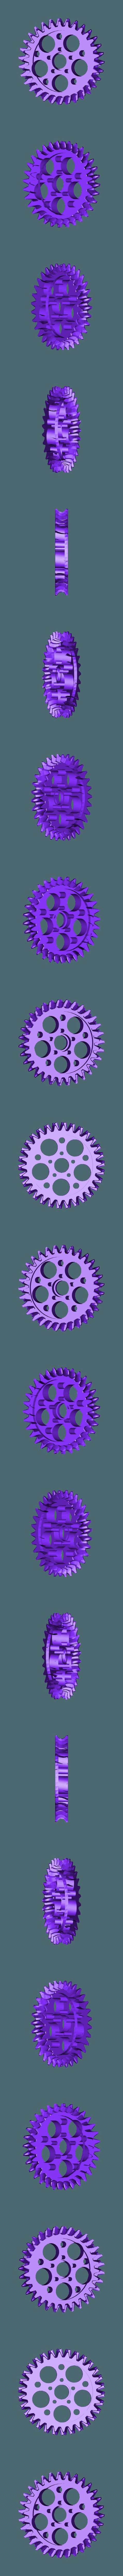 pinion.stl Download free STL file Worm gear reducer 30:1 • Model to 3D print, dasaki